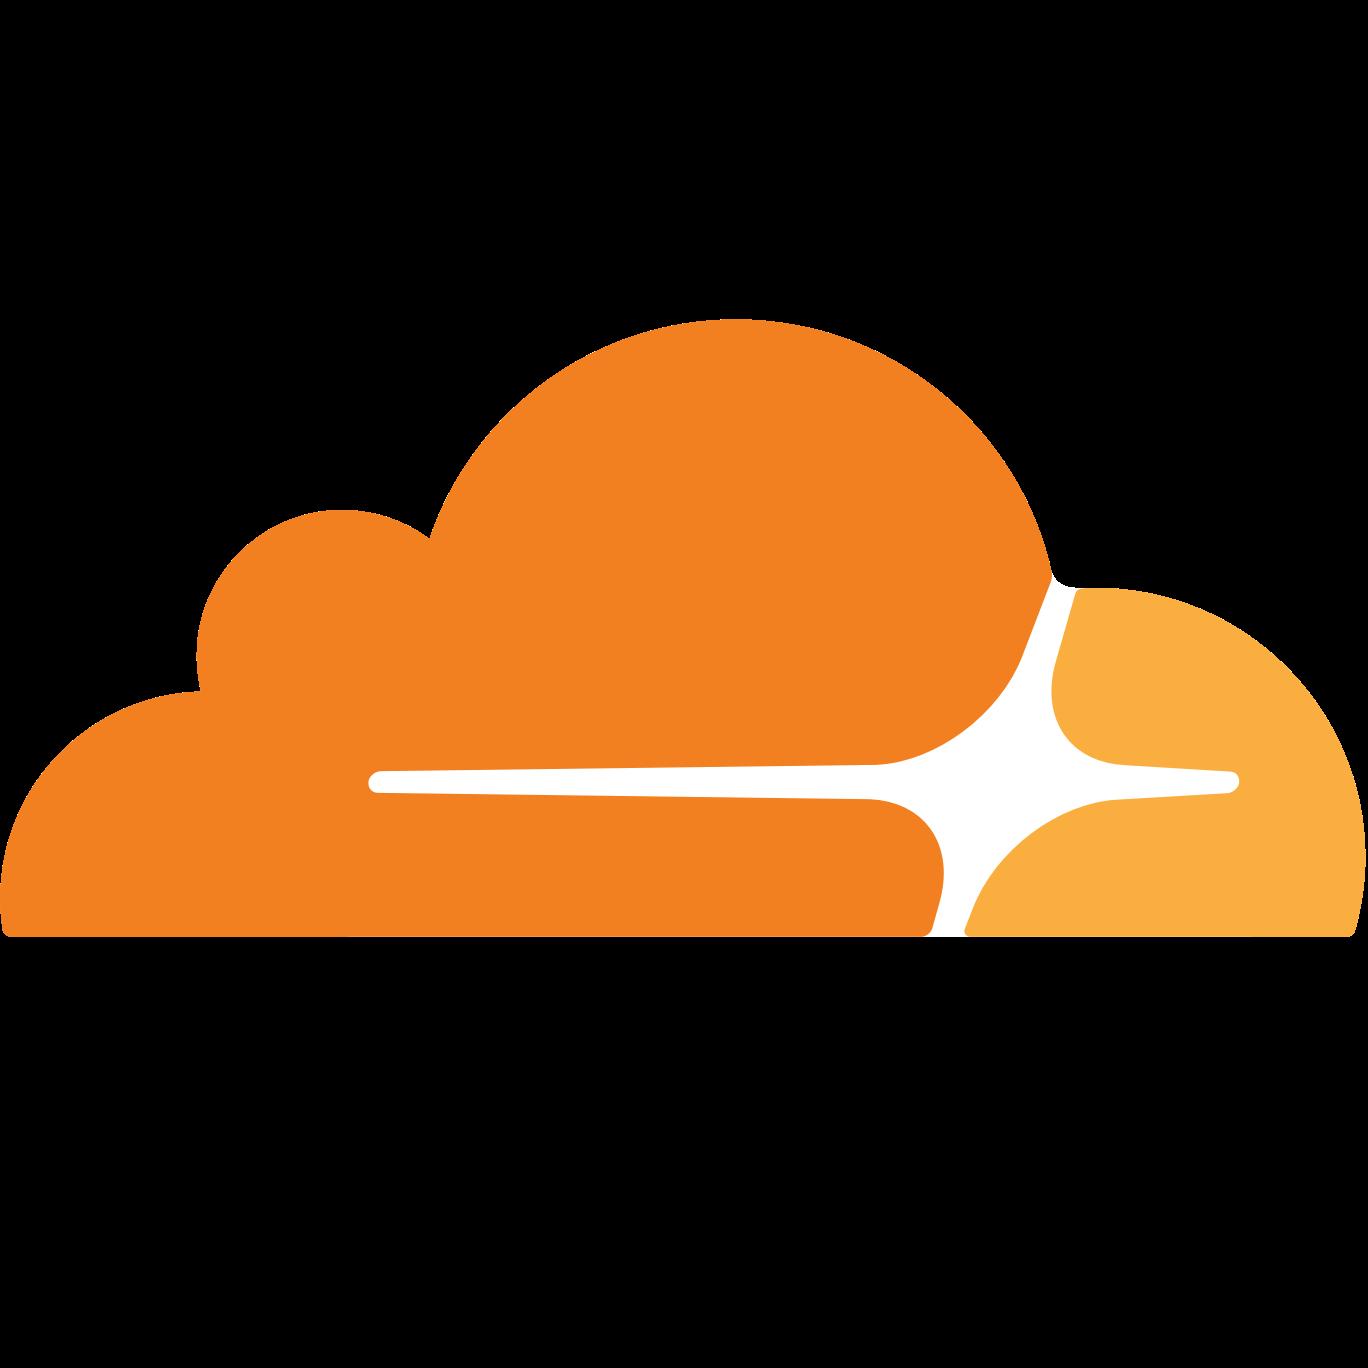 www.cloudflarestatus.com